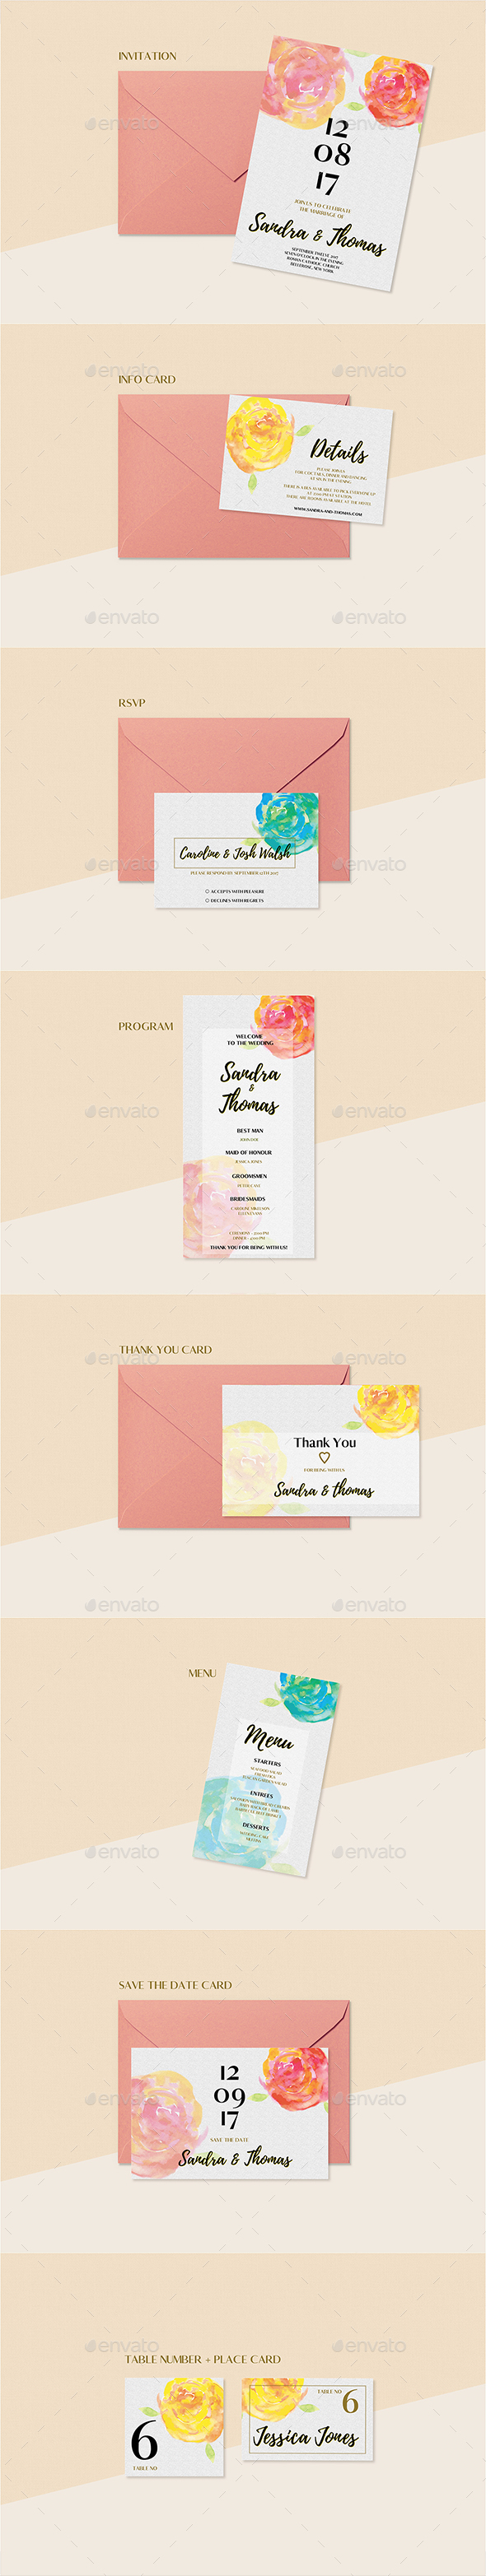 Floral Wedding Invitation Set - Invitations Cards & Invites